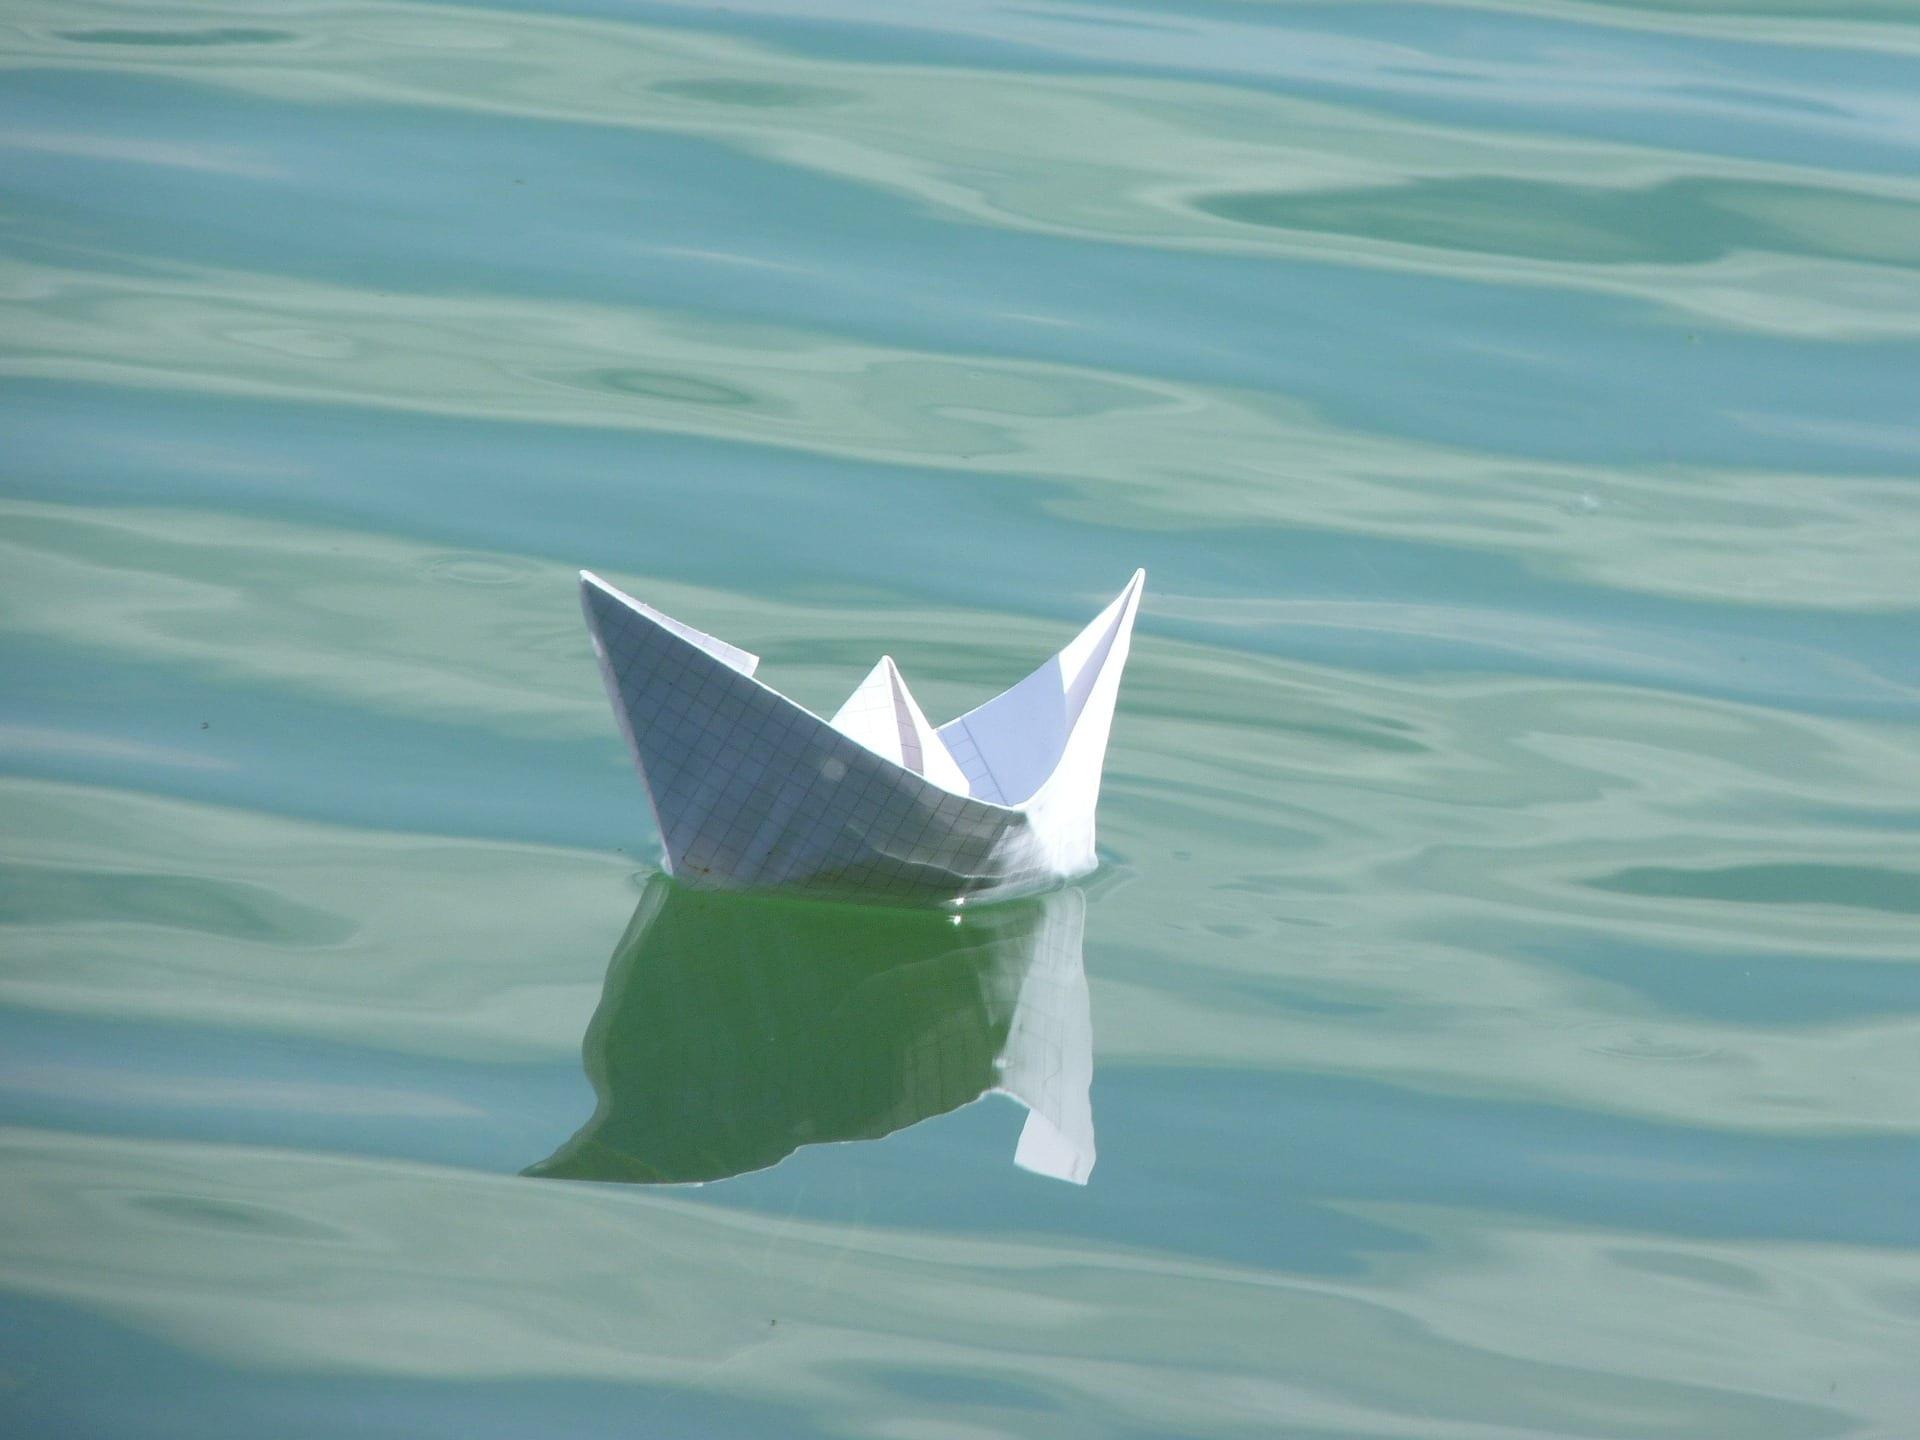 papierschiff-389016_1920